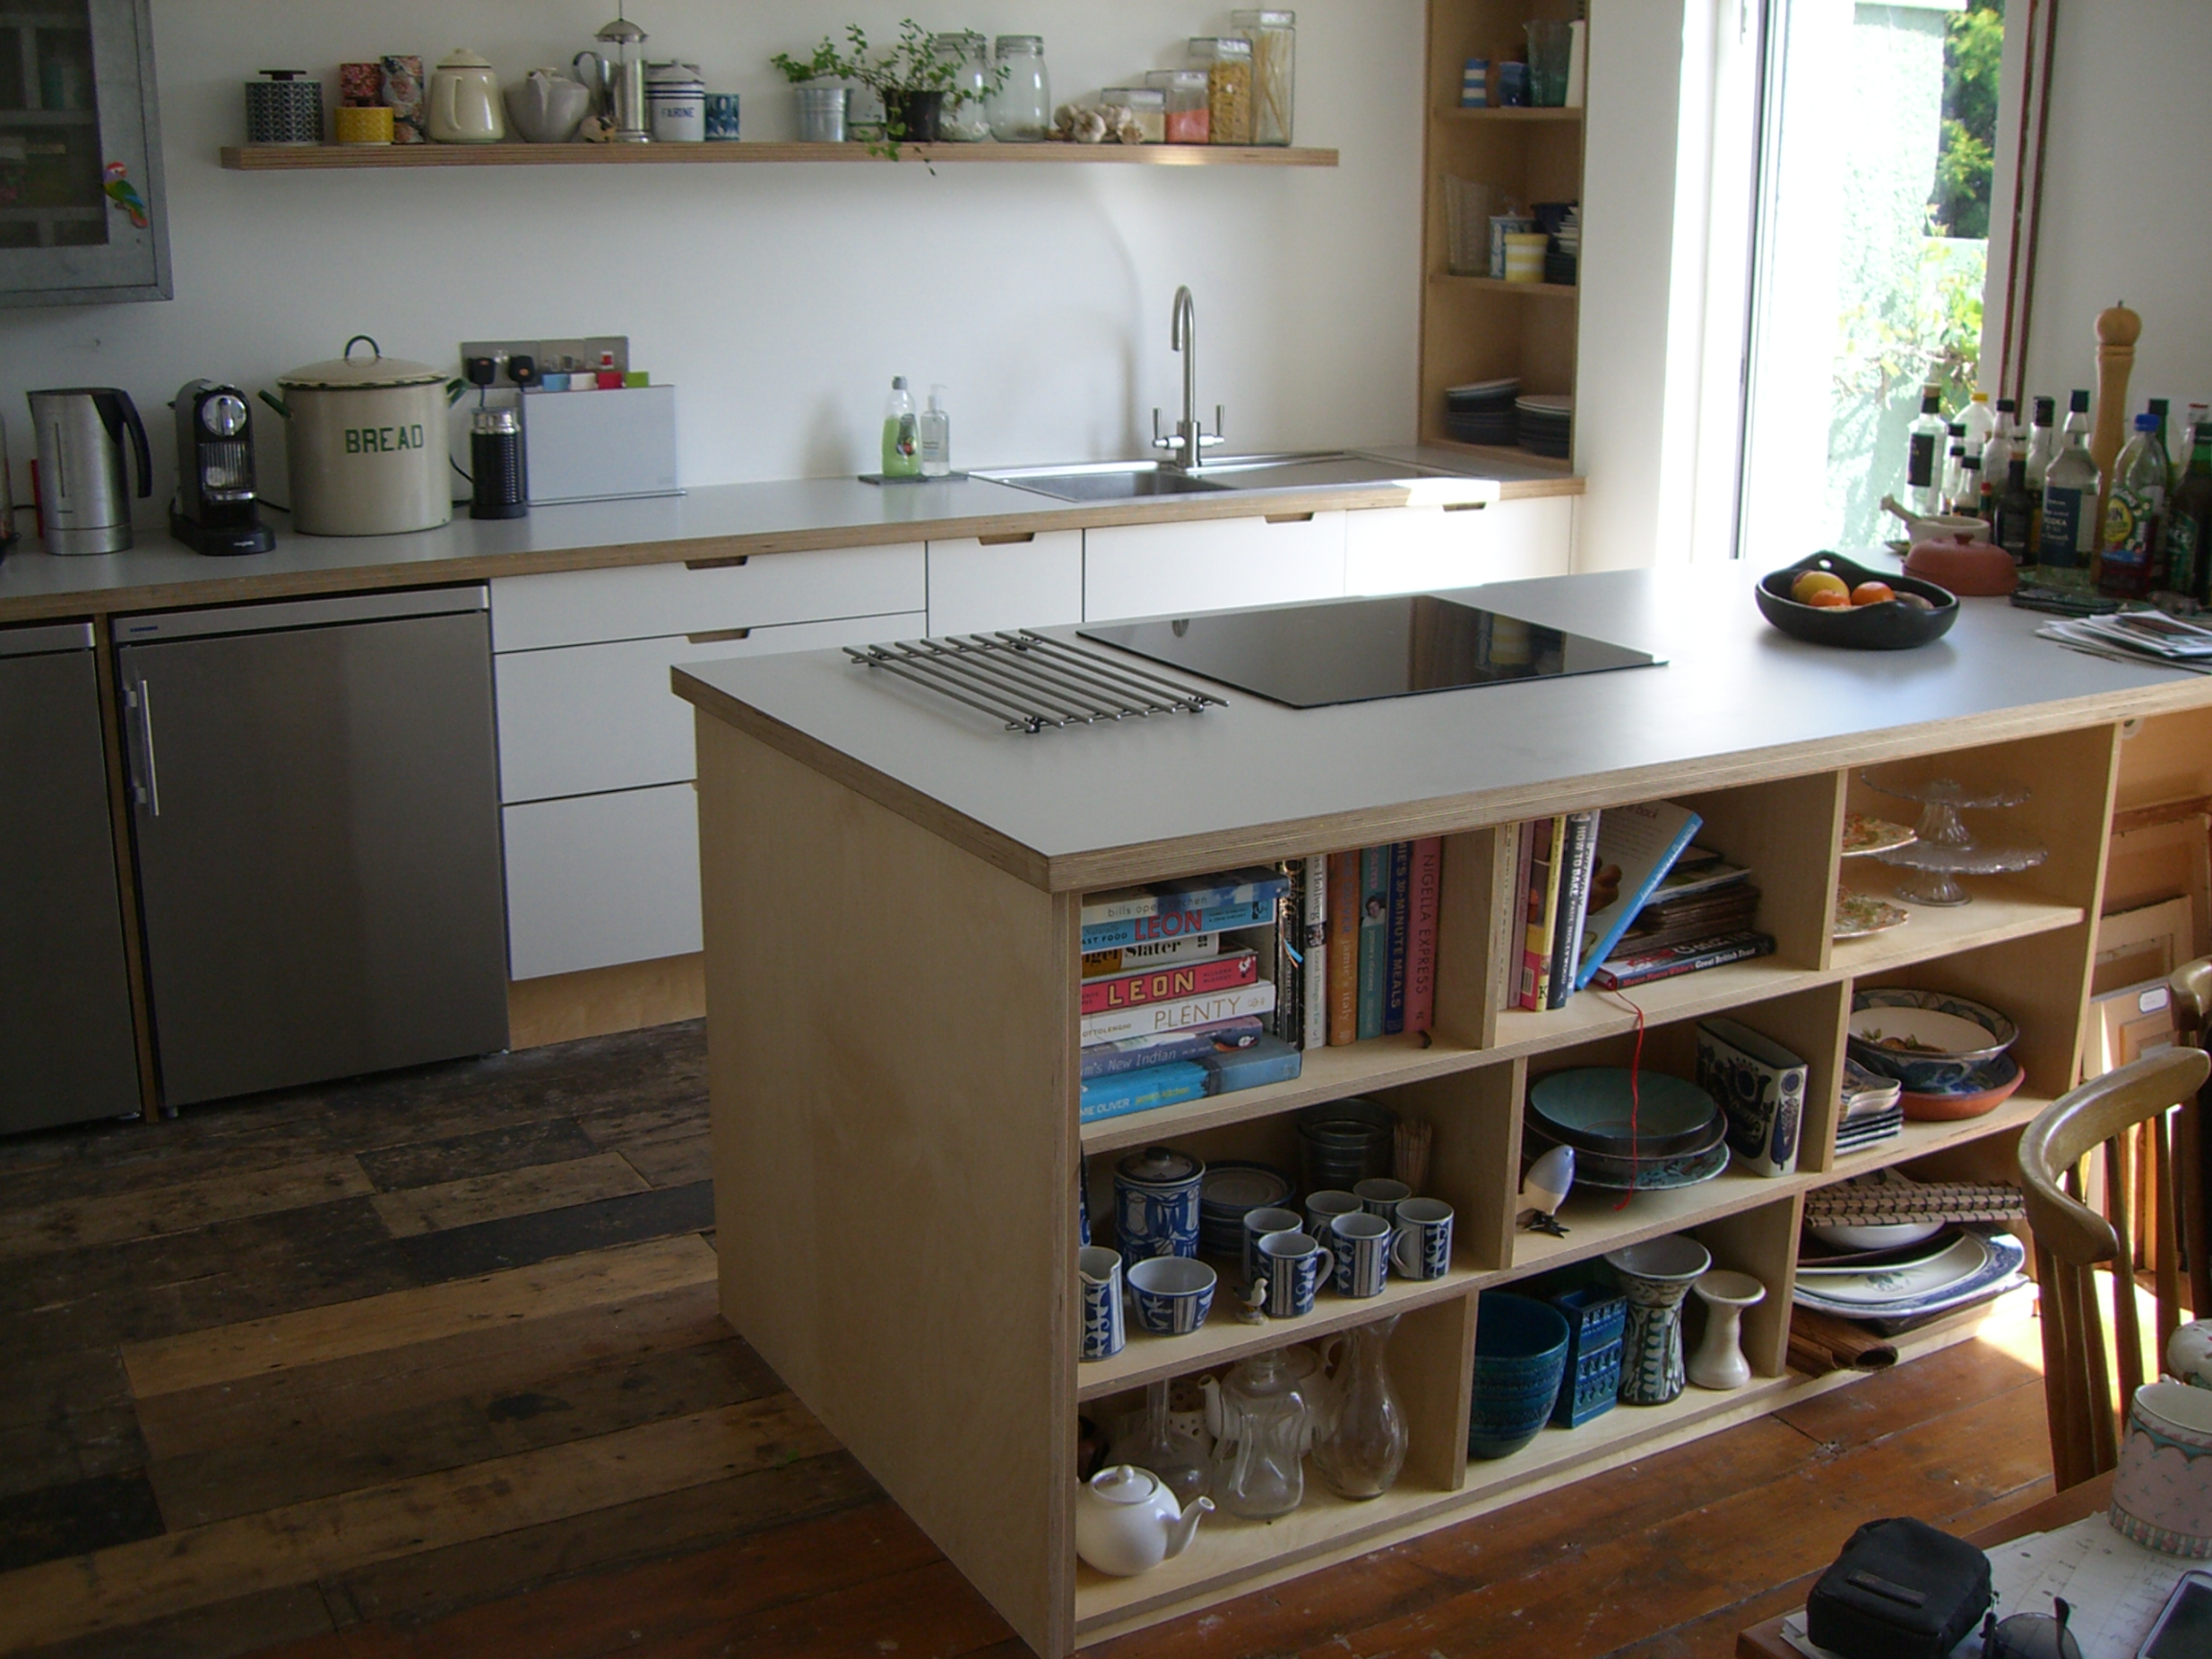 Kitchens | Bespoke Kitchens Bristol | Kitchen Furniture Design